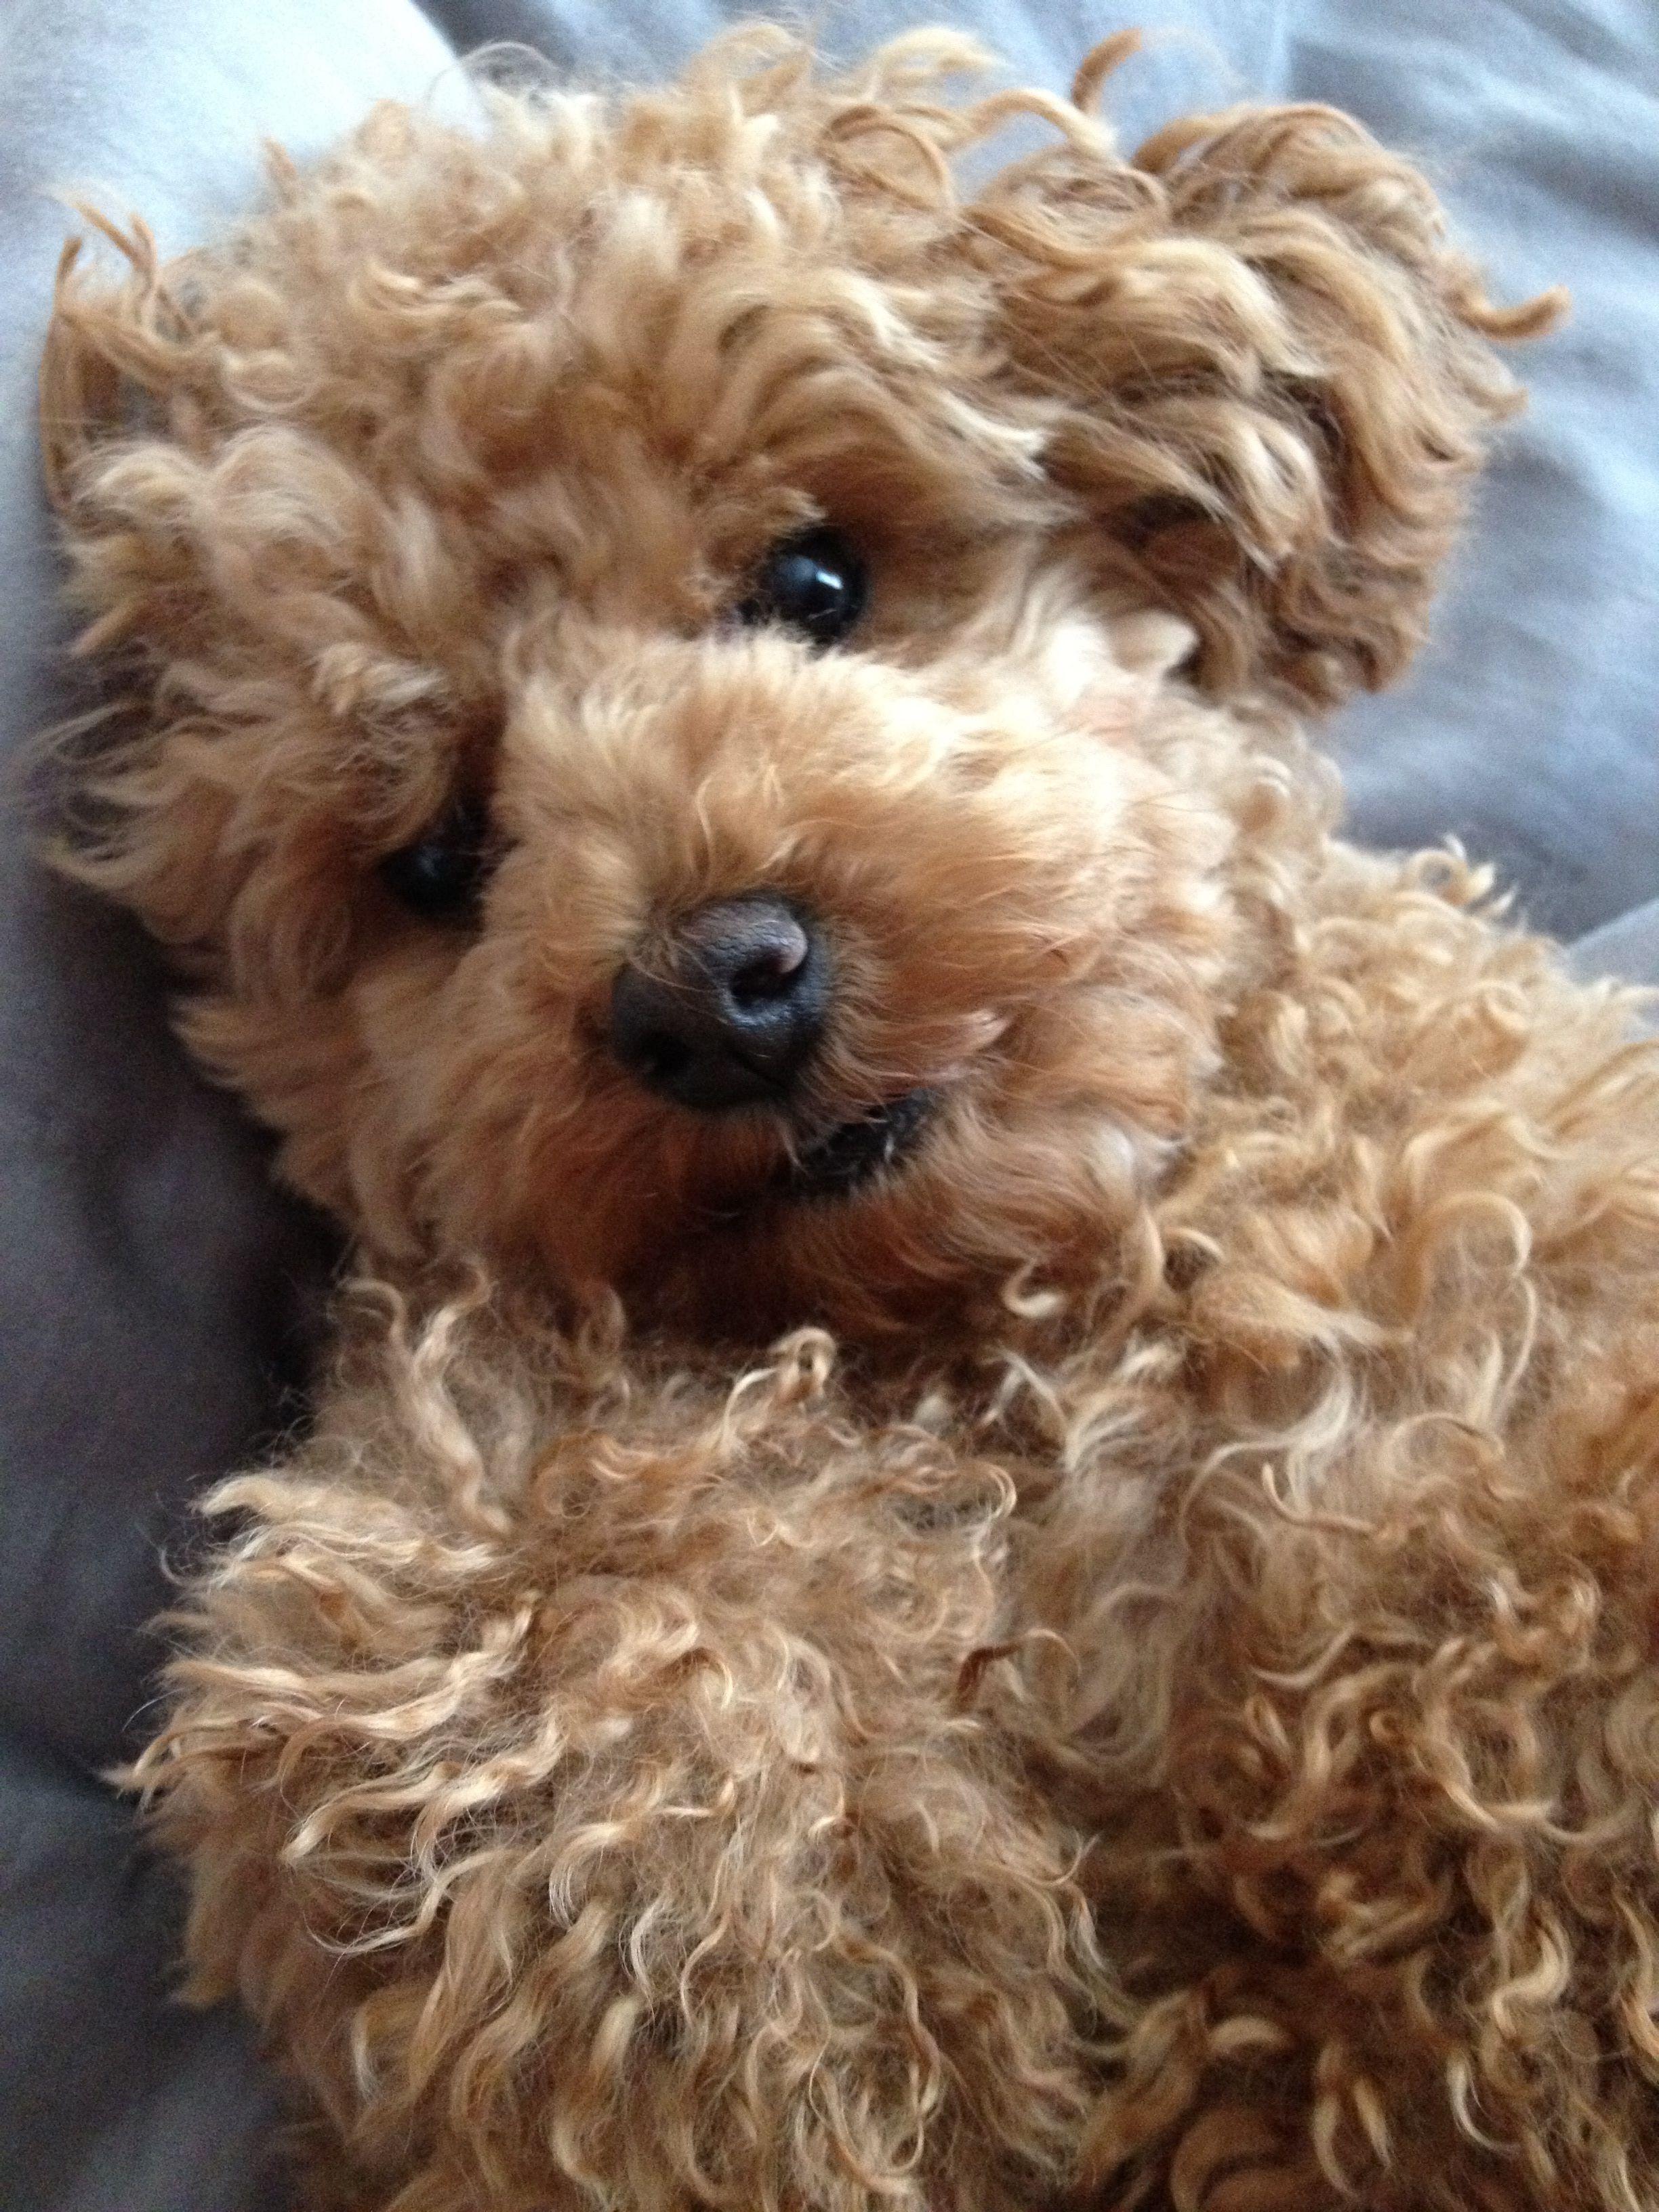 The cutest dog ever, Max, or teddy bear perhaps?! Teddy